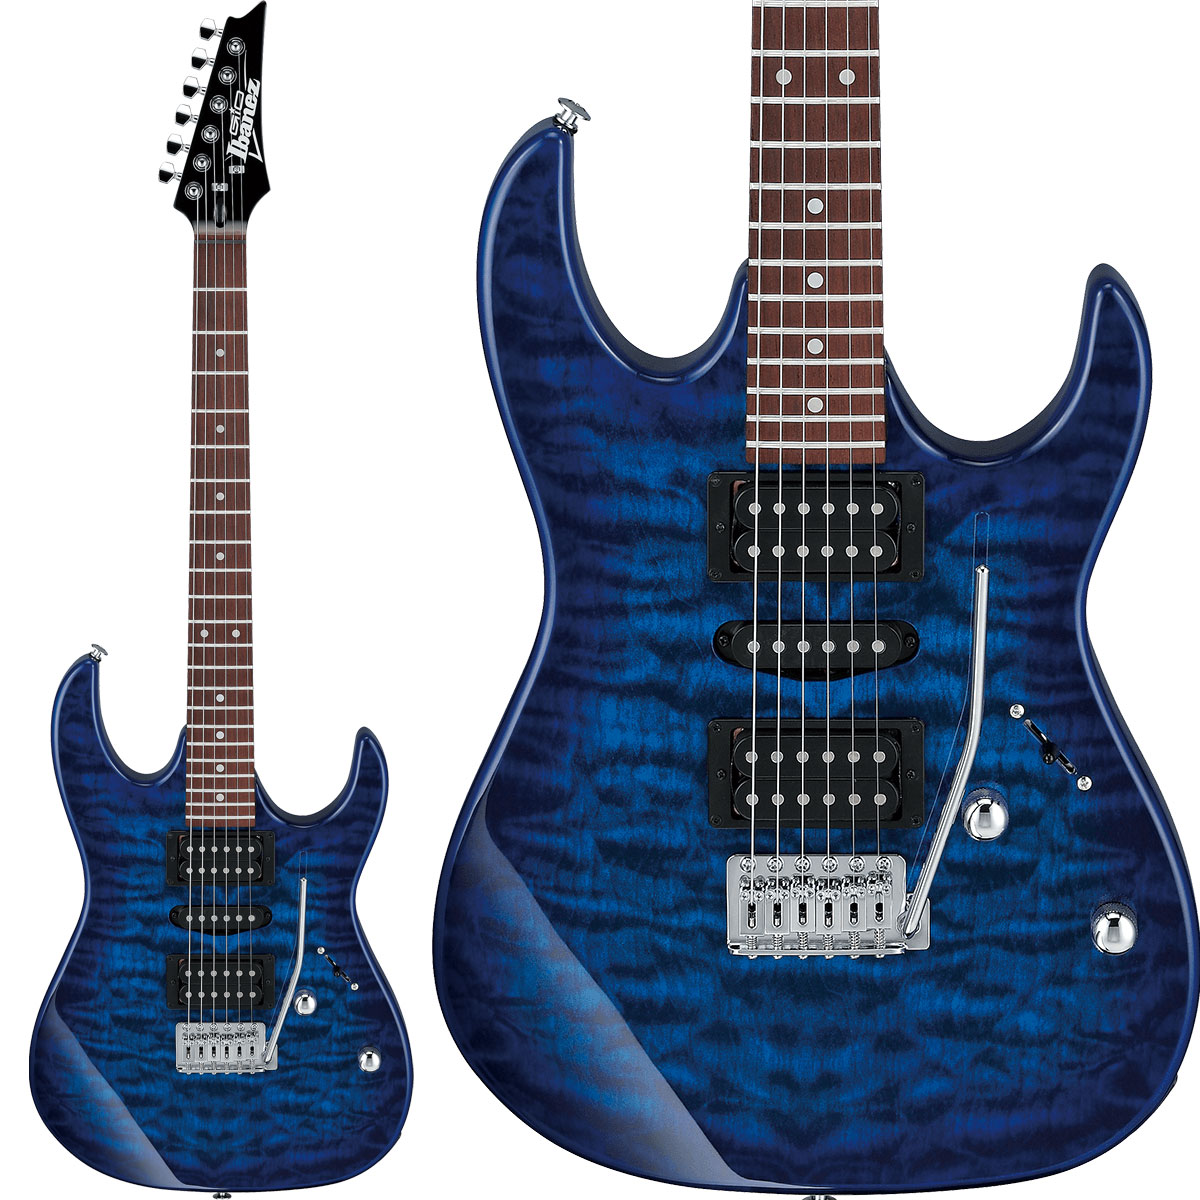 Gio Ibanez GRX70QA TBB (Transparent Blue Burst) エレキギター 【ジオ アイバニーズ】【純正アクセサリーキット付属】